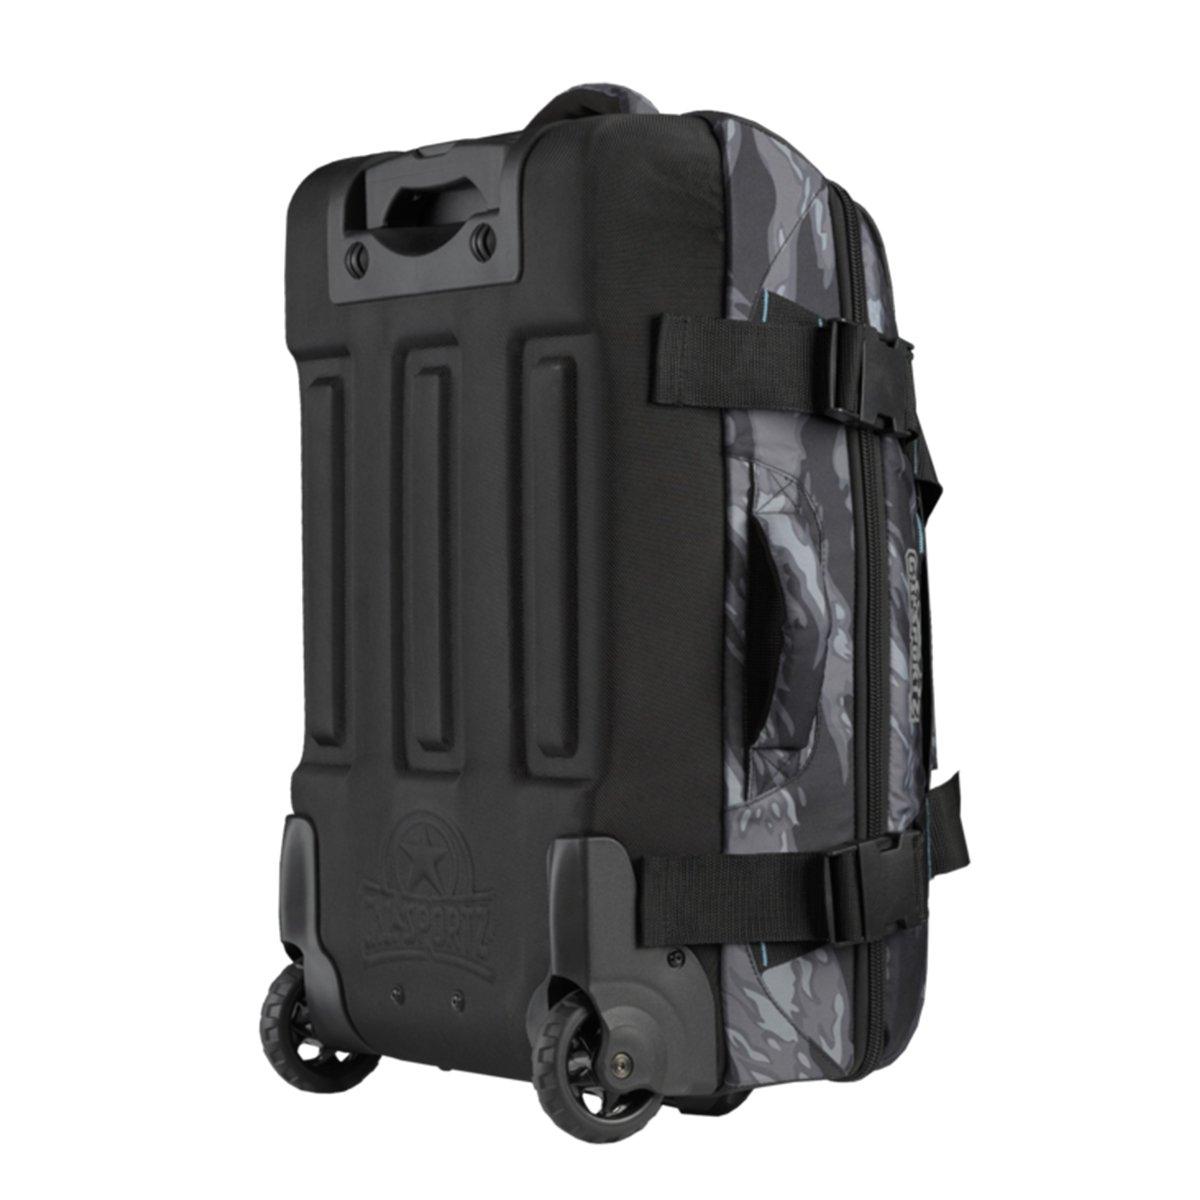 GI Sportz Paintball FLY'R 2.0 Carry On Gear Bag - Tiger Black by GI Sportz (Image #3)